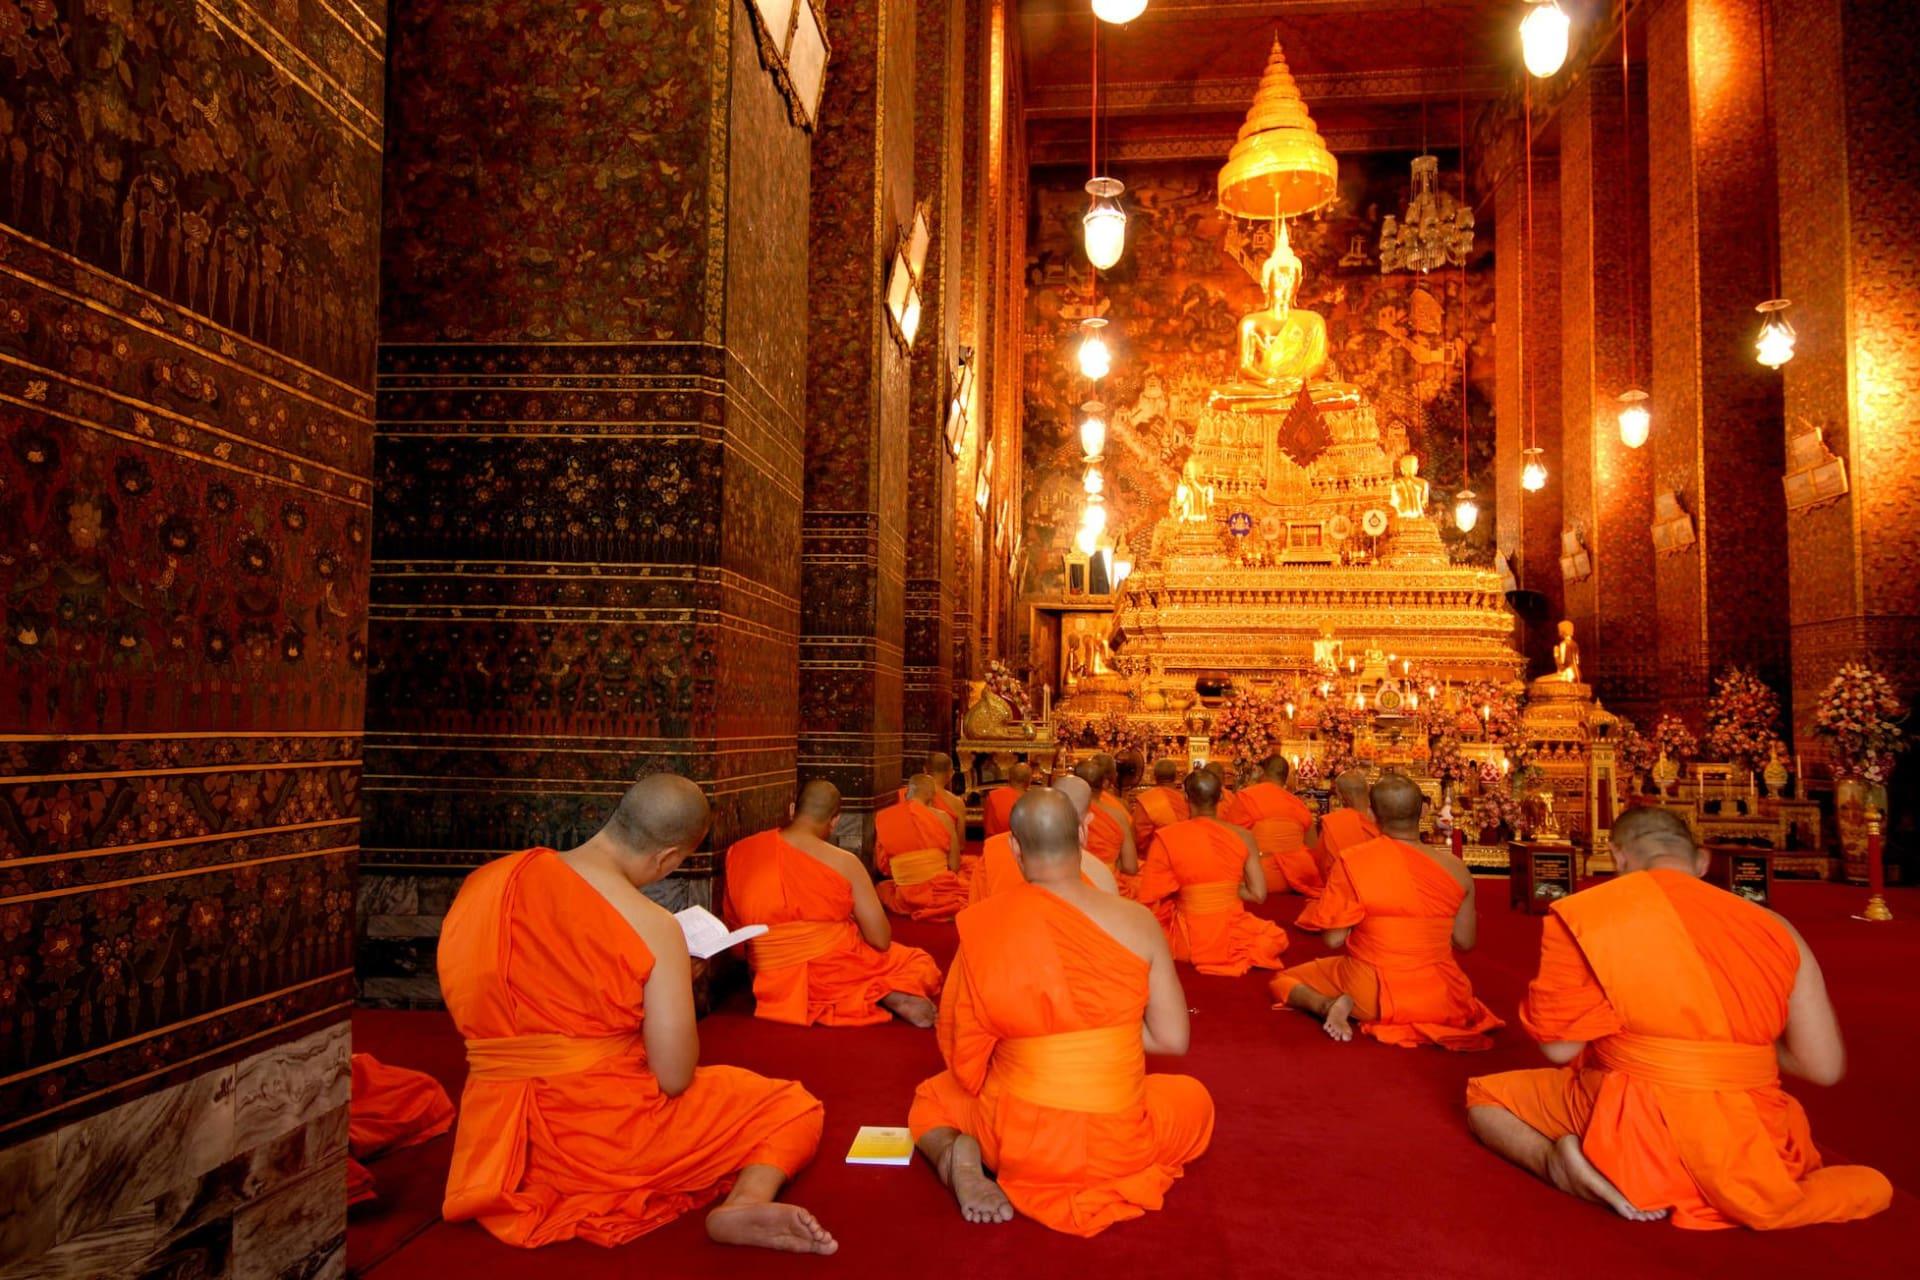 Bangkok: Buddha image and monks in Wat Pho Temple